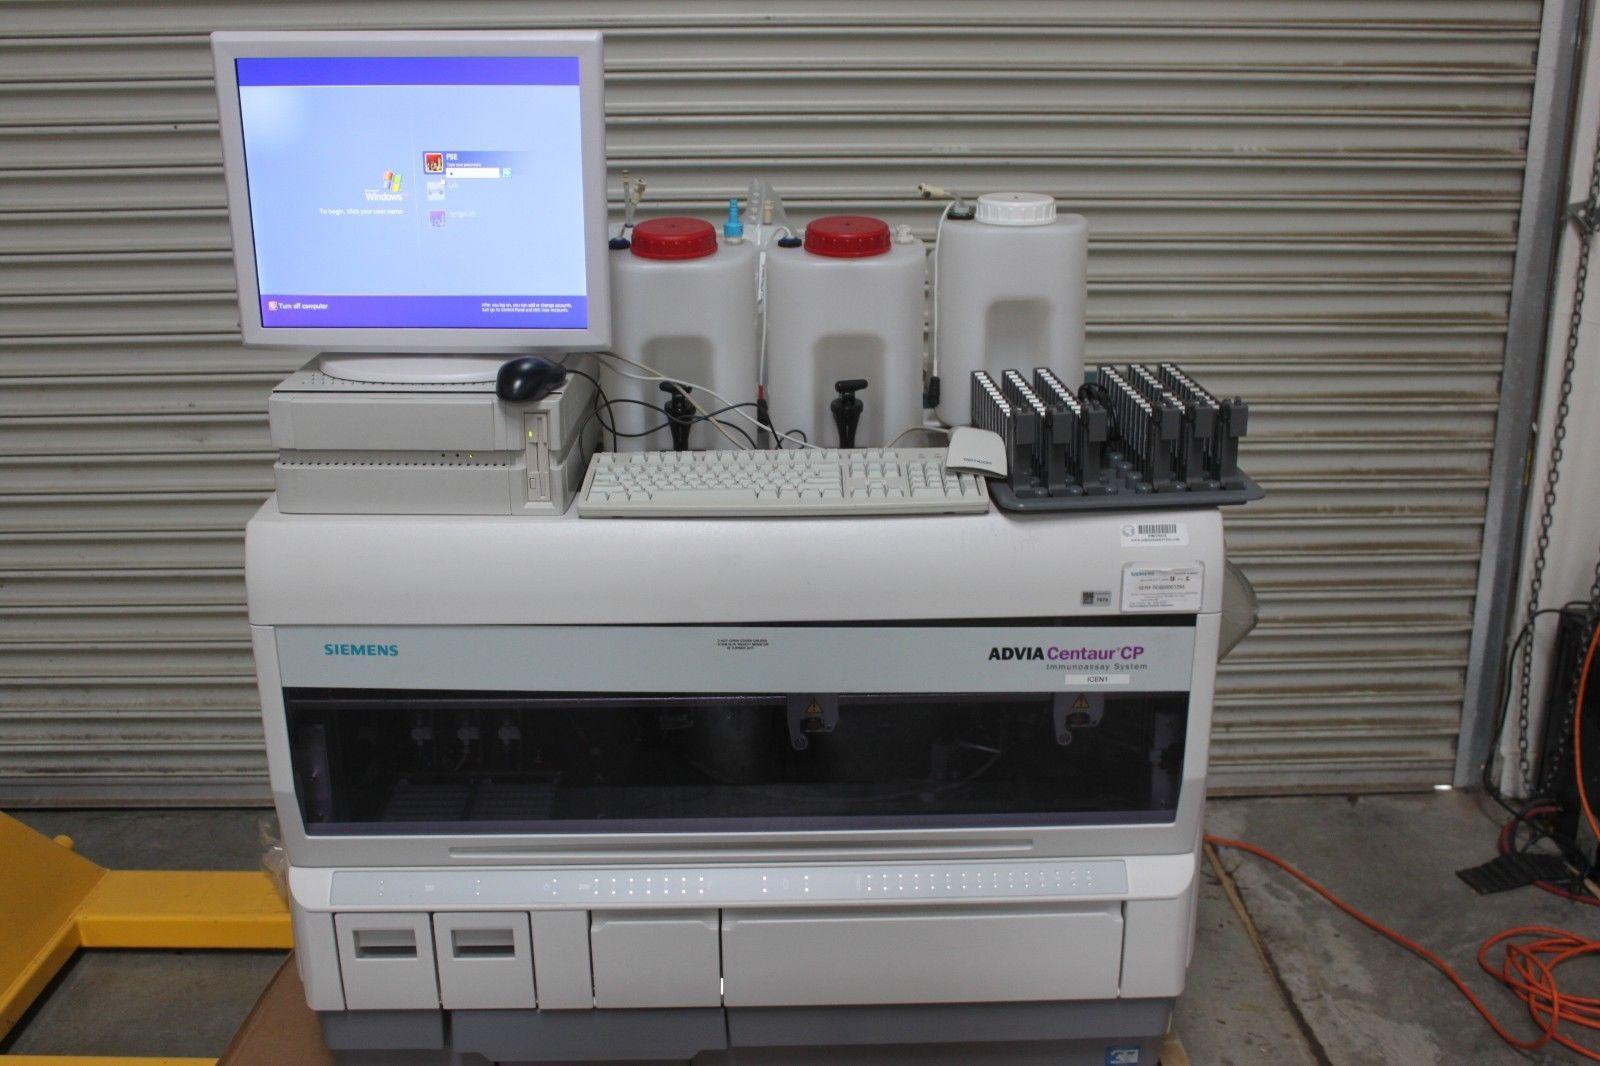 Siemens Advia Centaur CP Immunoassay System